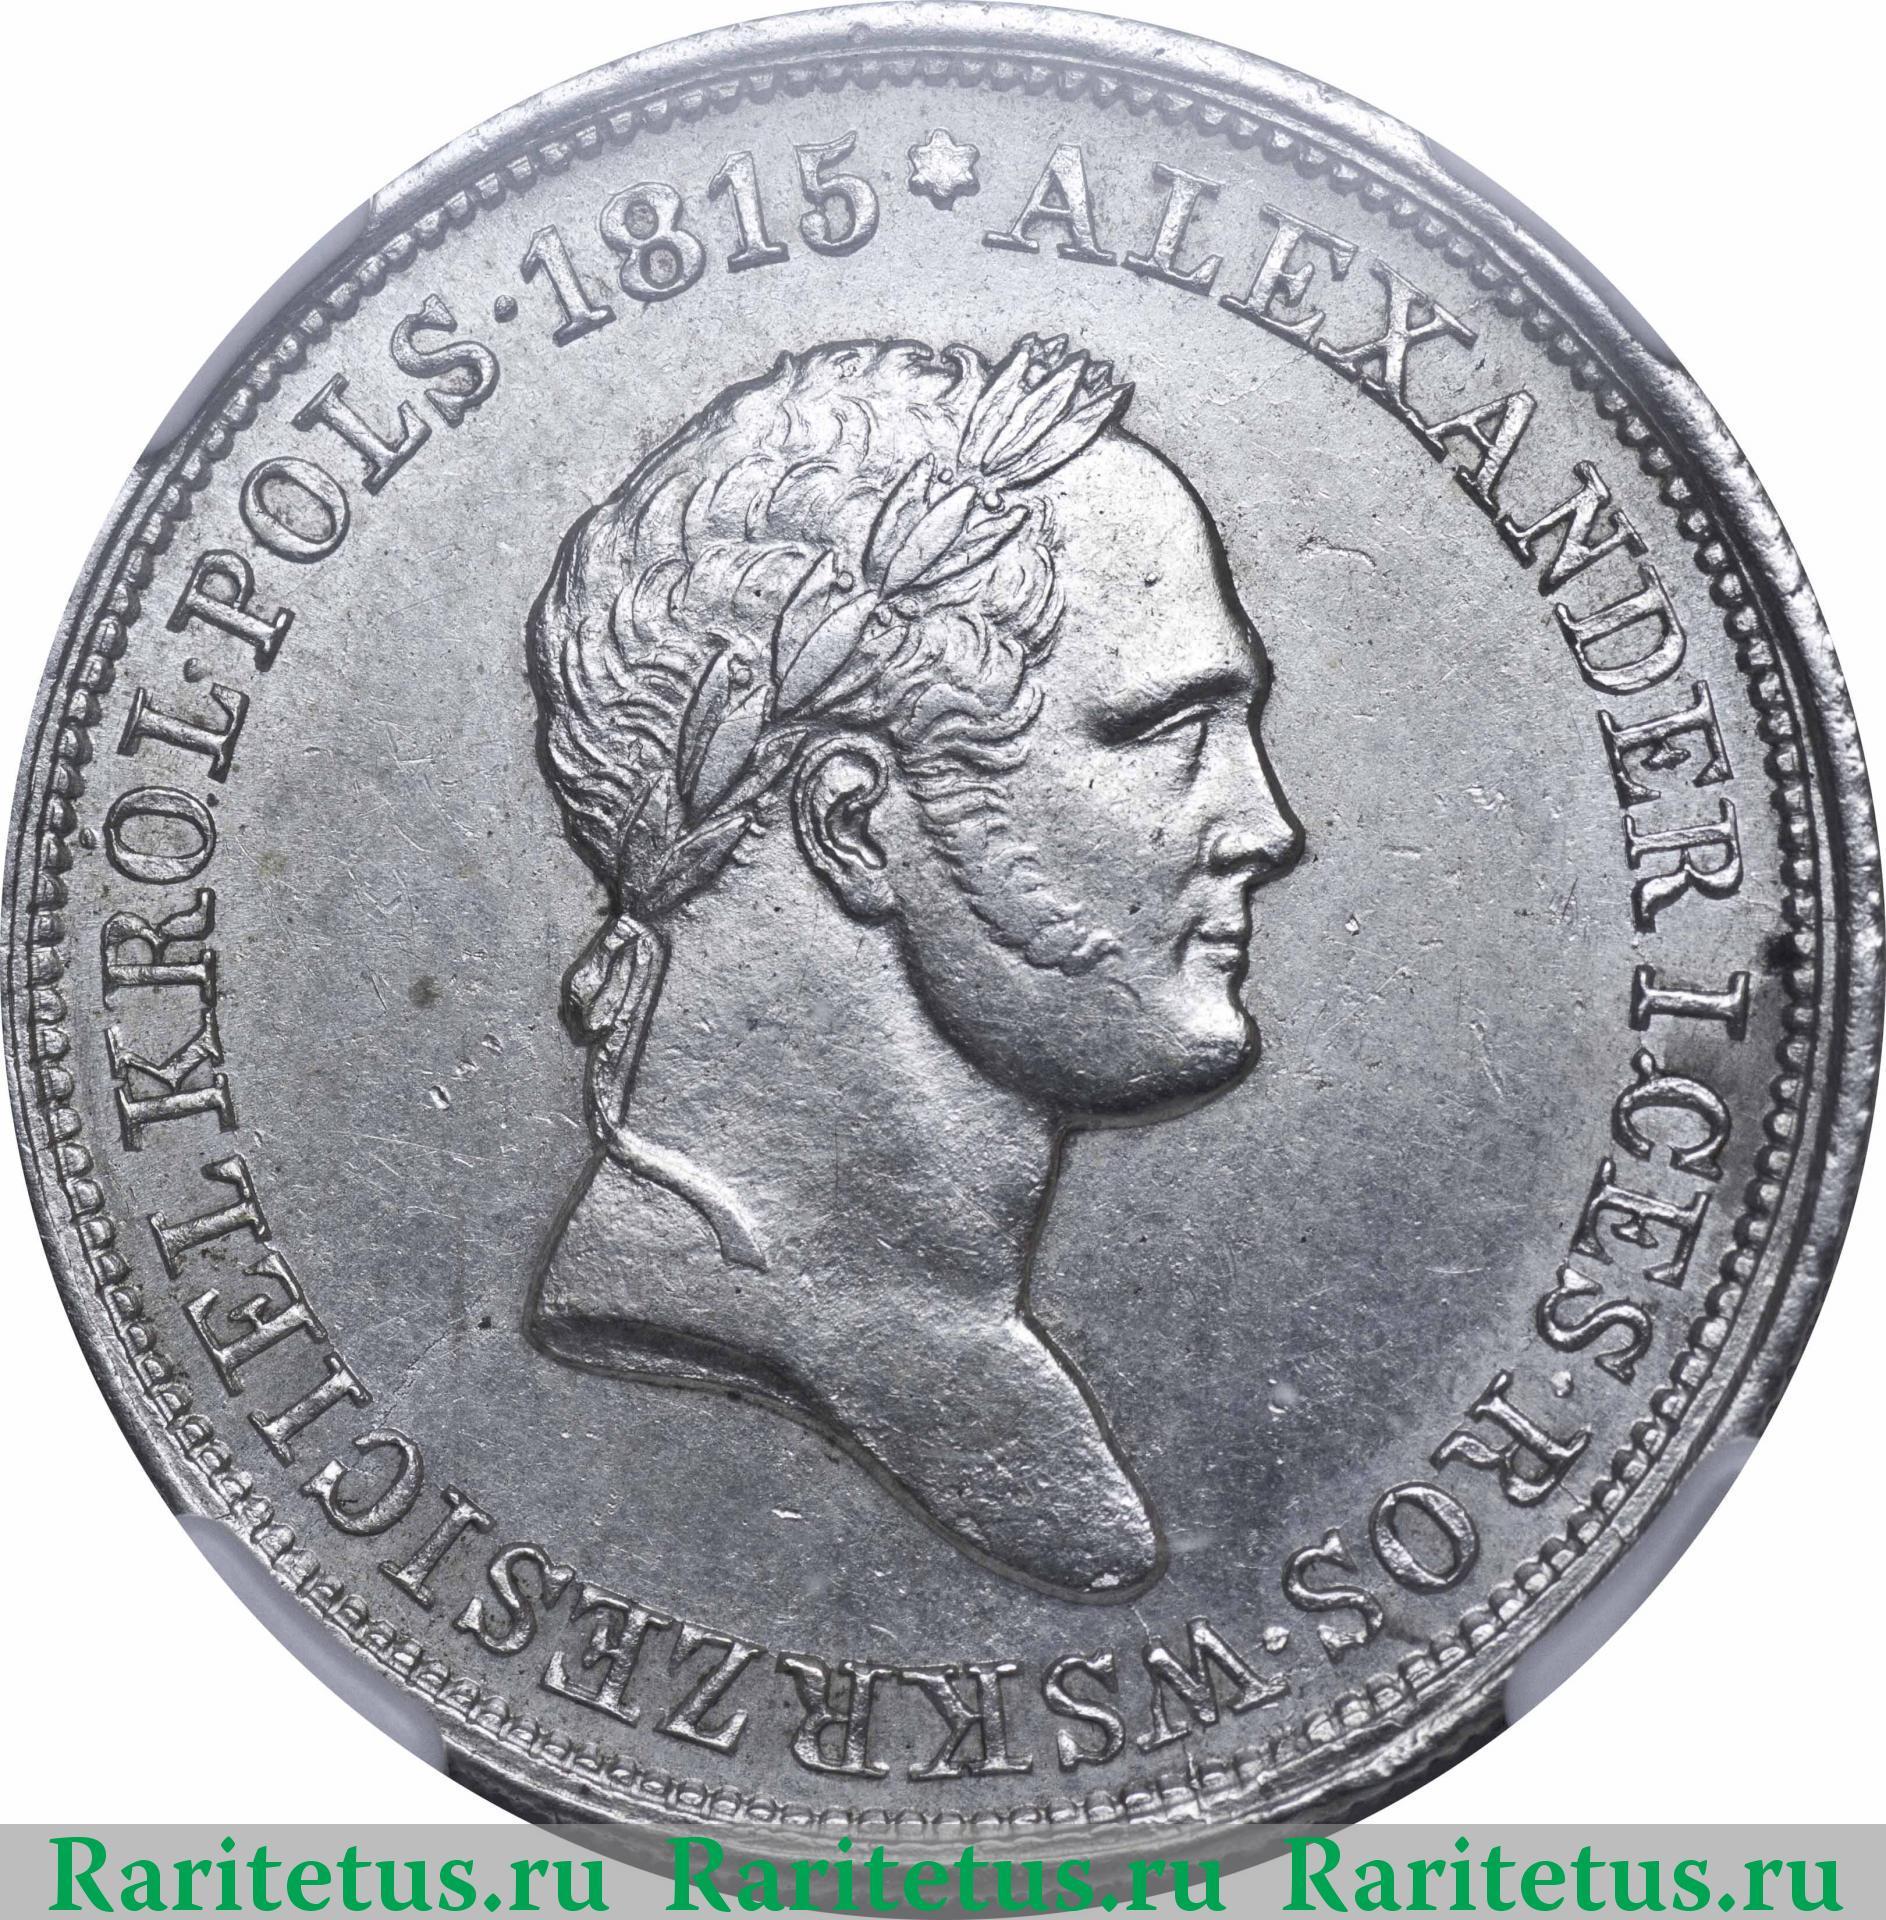 Цены монет 2 злотых 1 лари 2006 года фифа